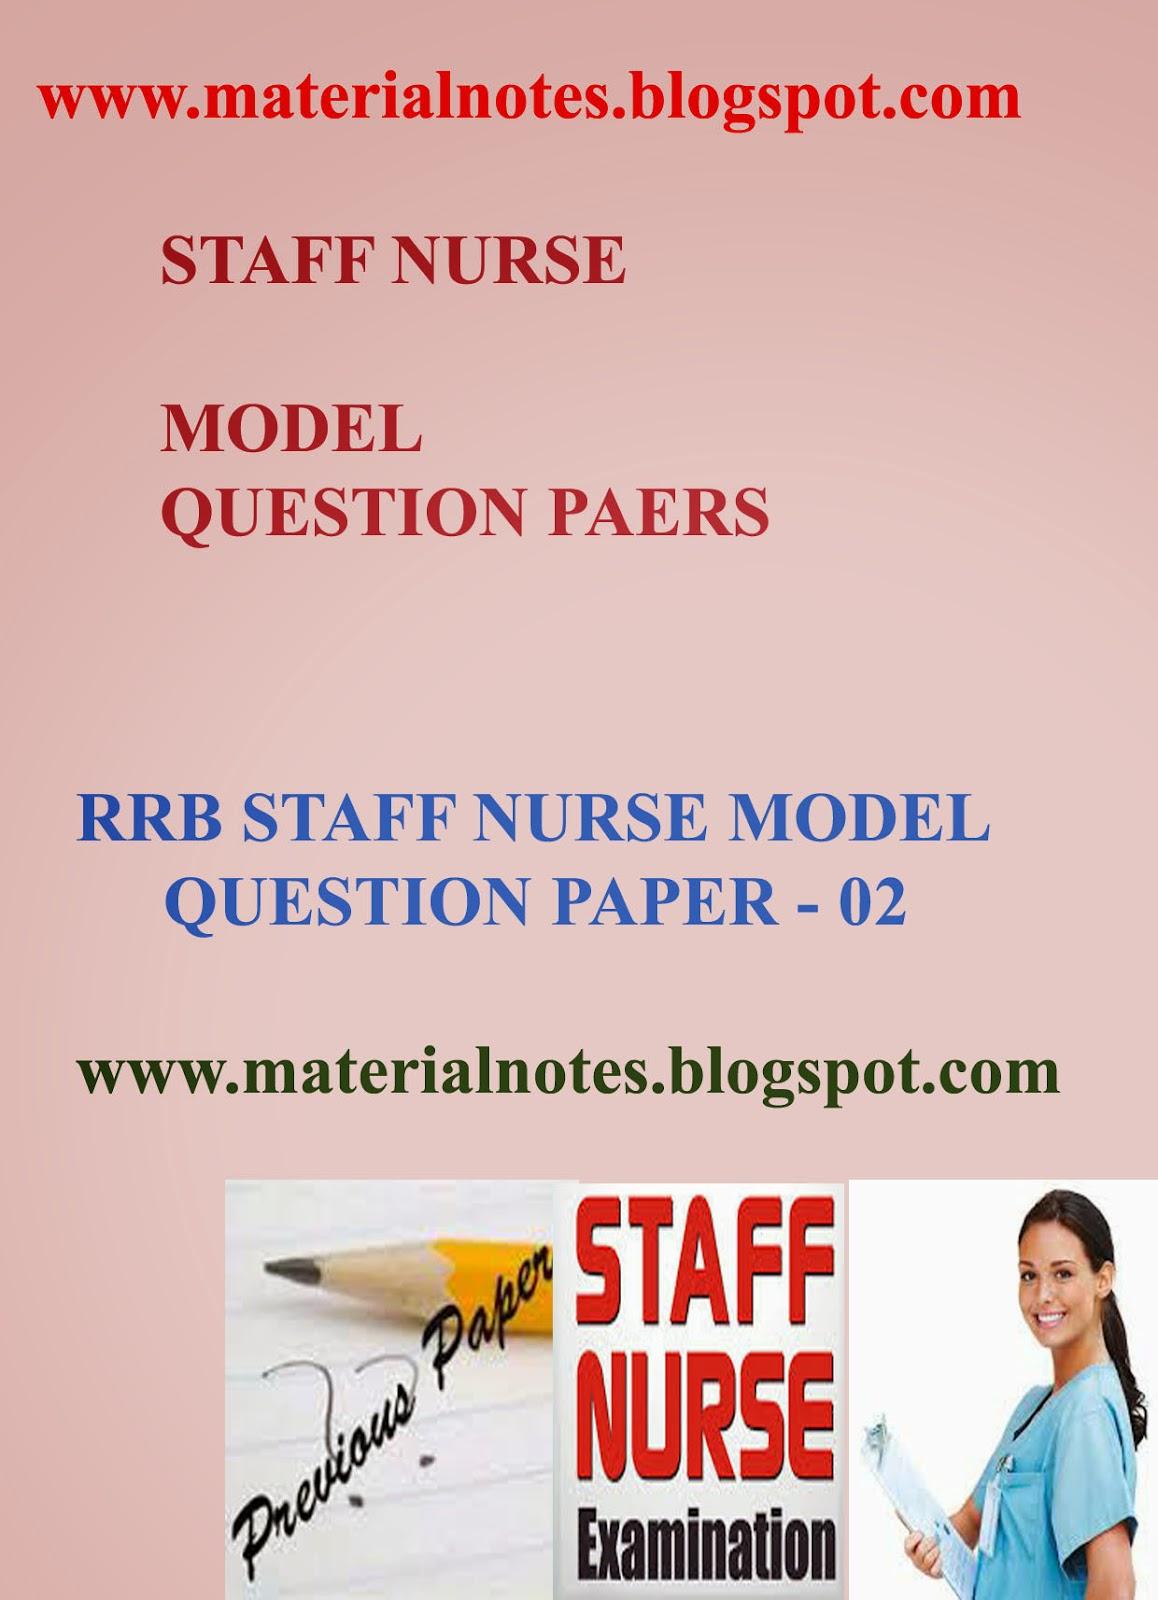 rrb staff nurse model question paper